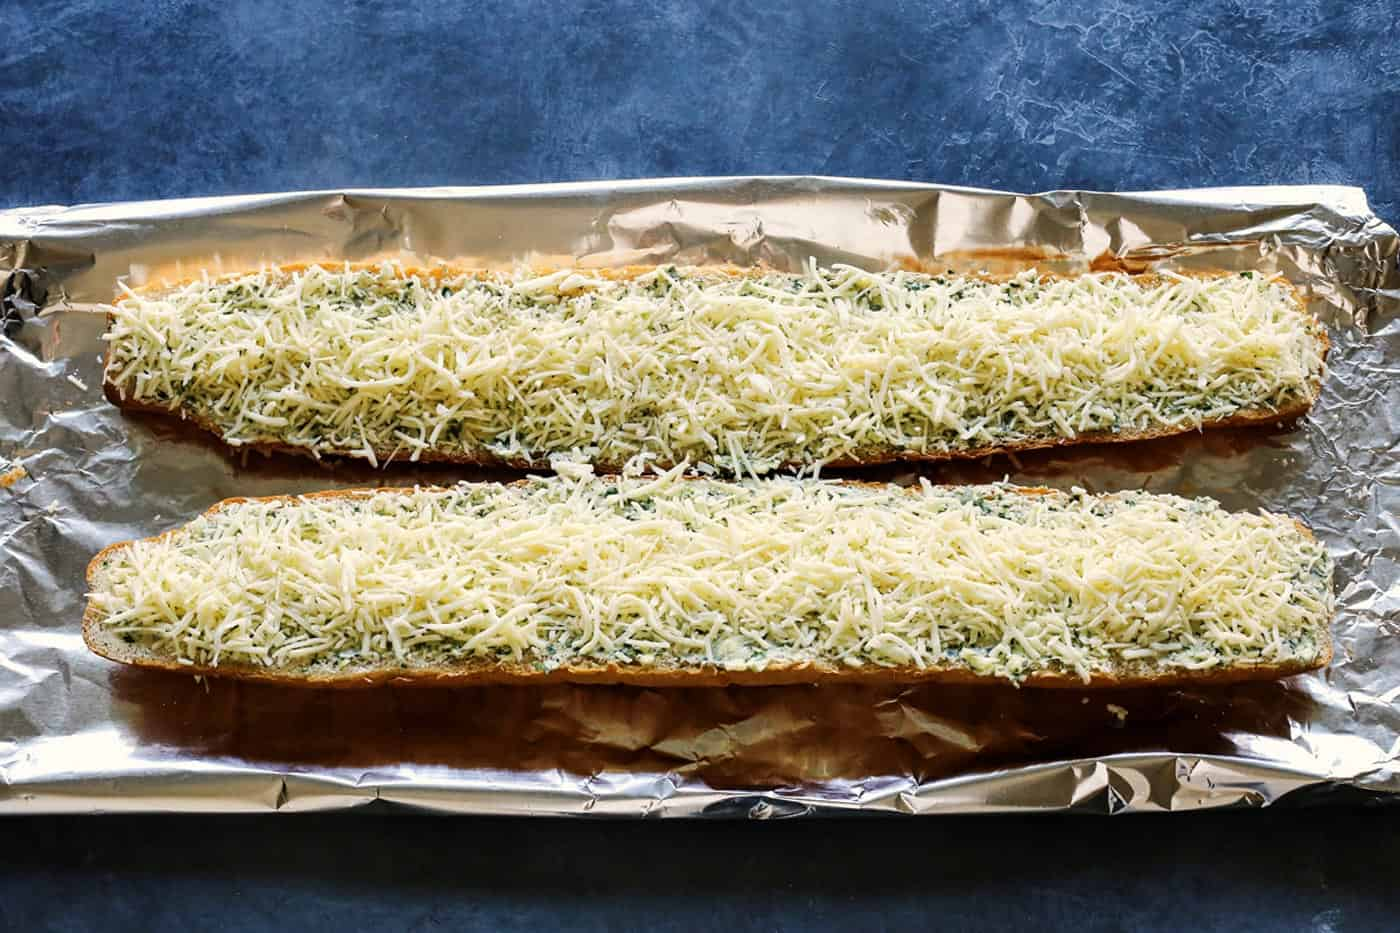 shredded cheese on garlic bread halves